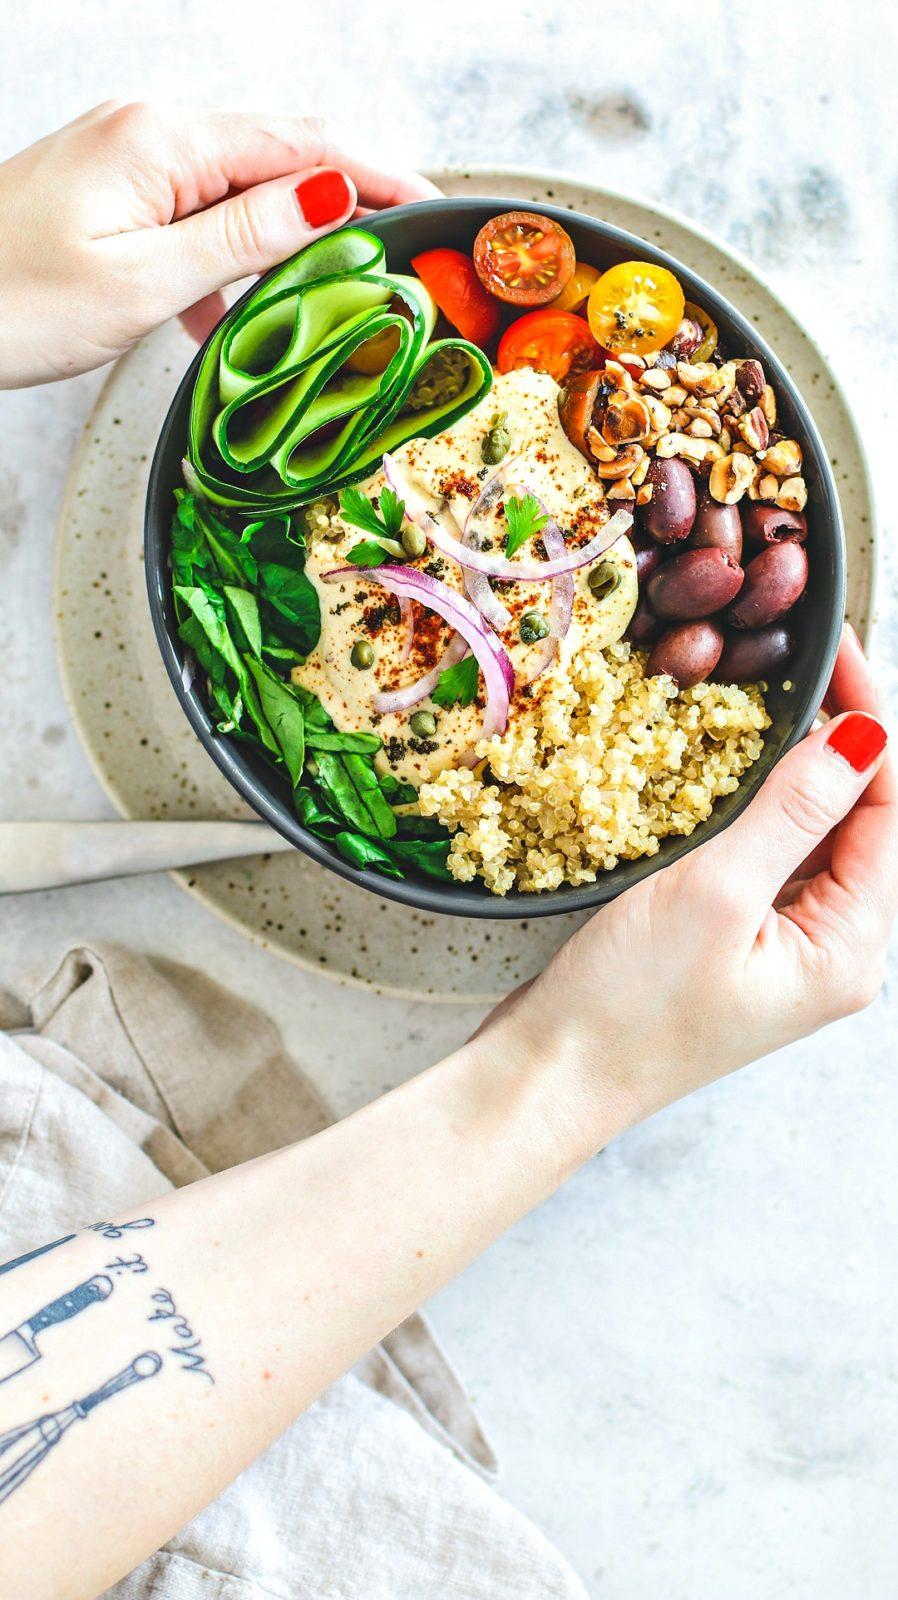 Hands holding bowl of Mediterranean Quinoa Salad